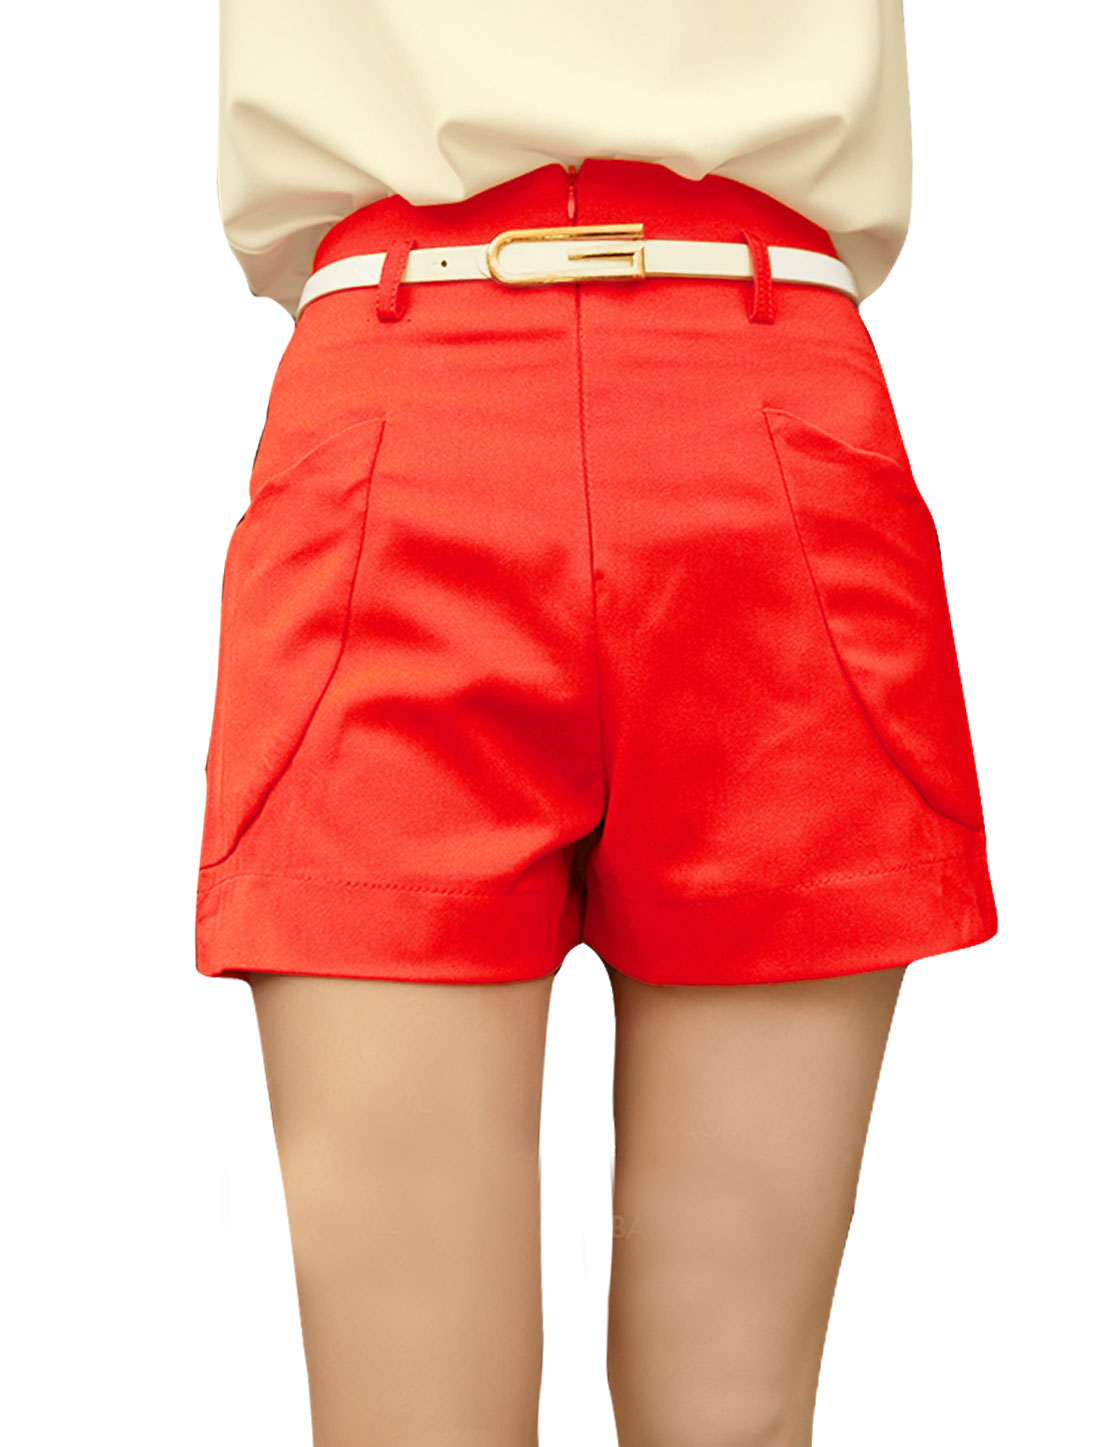 Women's High Waist Simple Design Stylish Retro Orange XS Shorts